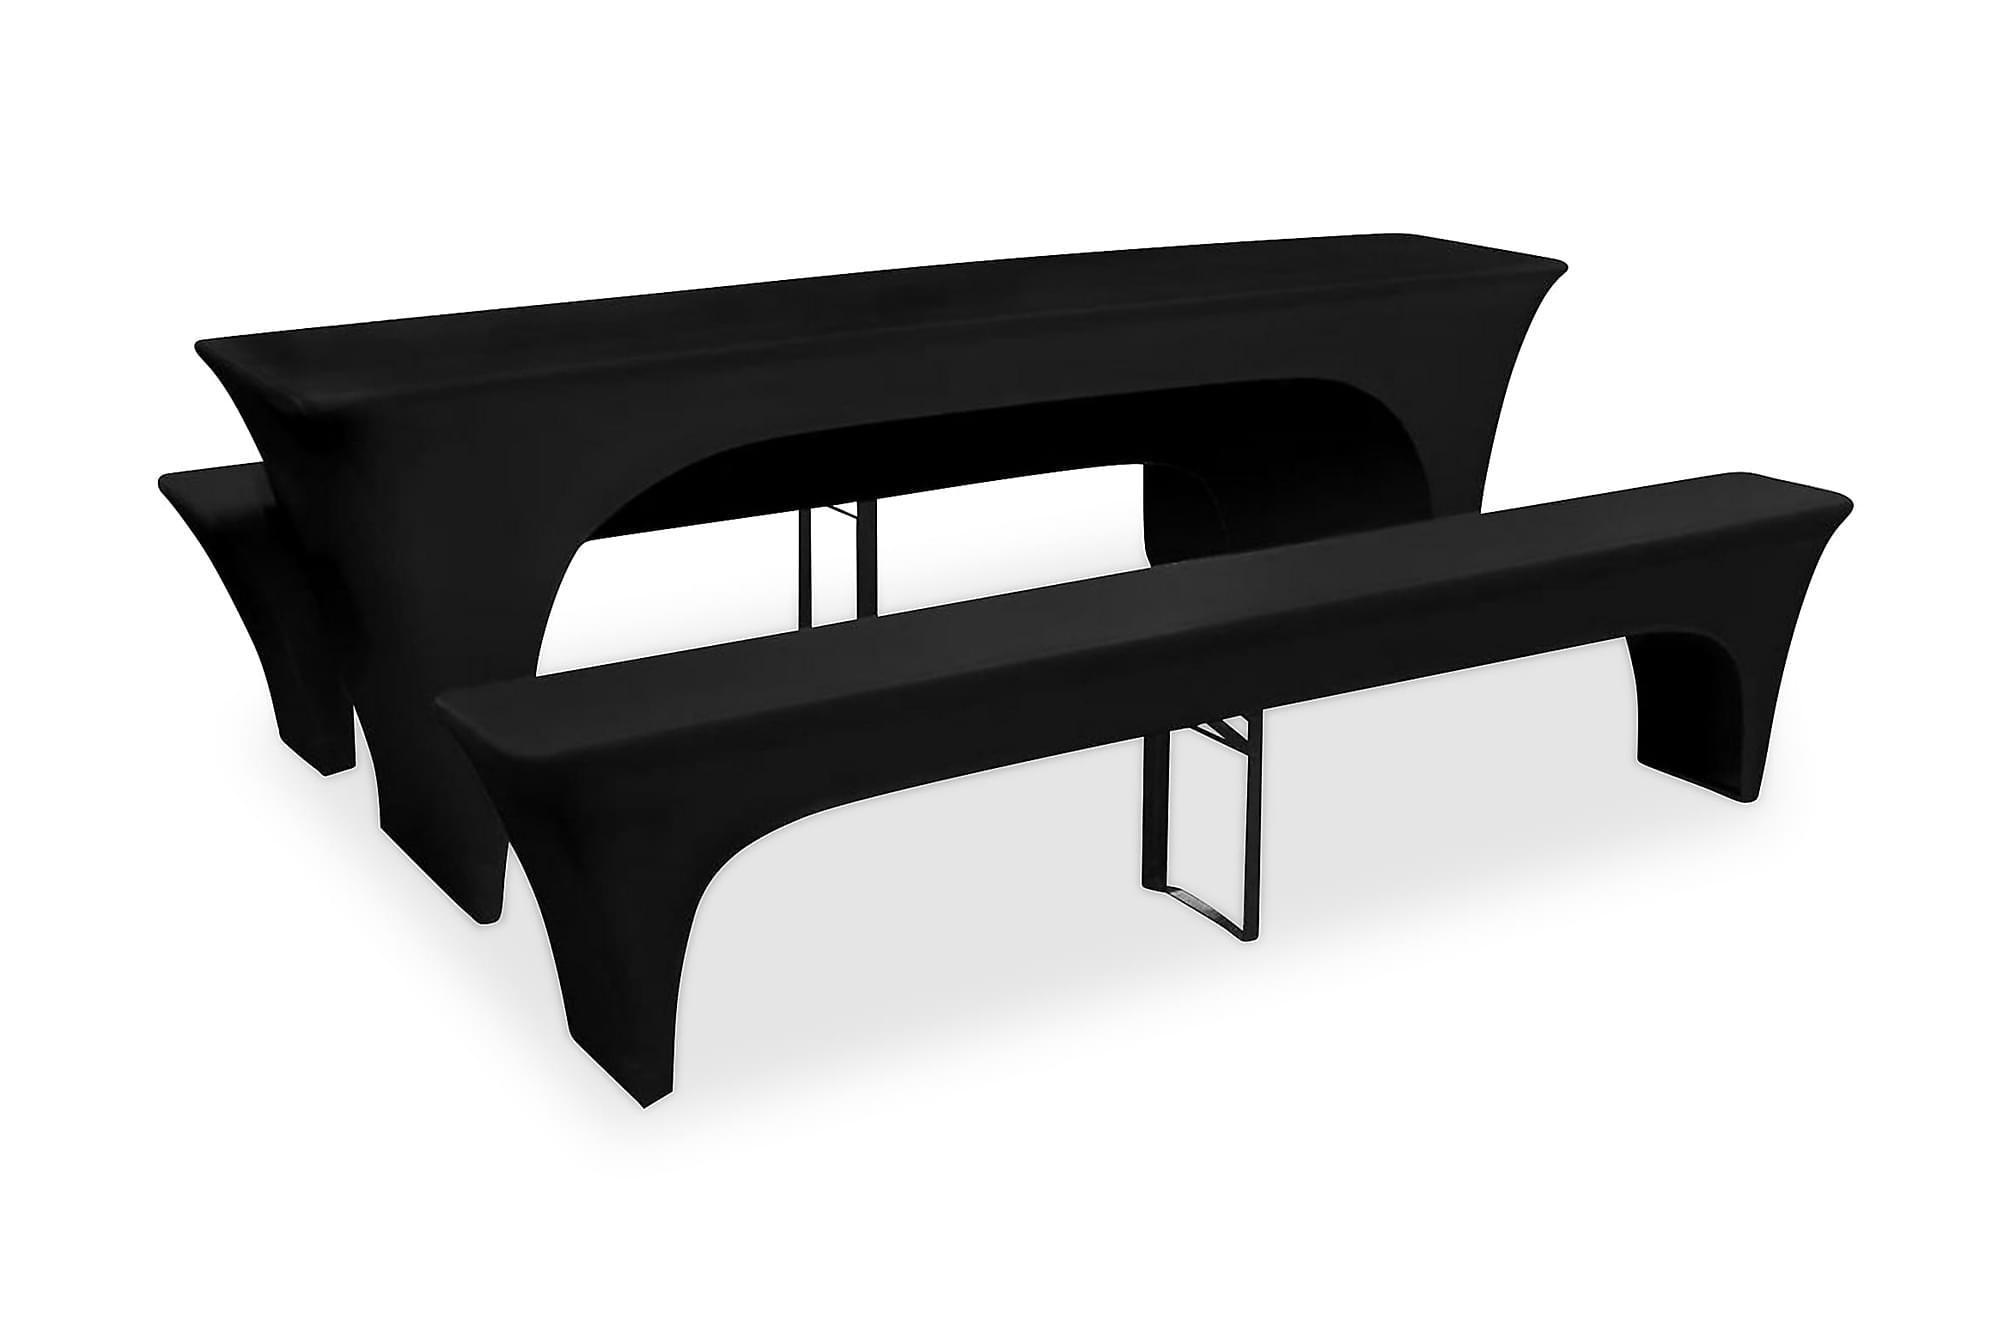 3 Möbelöverdrag för ölbord&bänkarstretch Svart 220x50x80cm, Möbelöverdrag